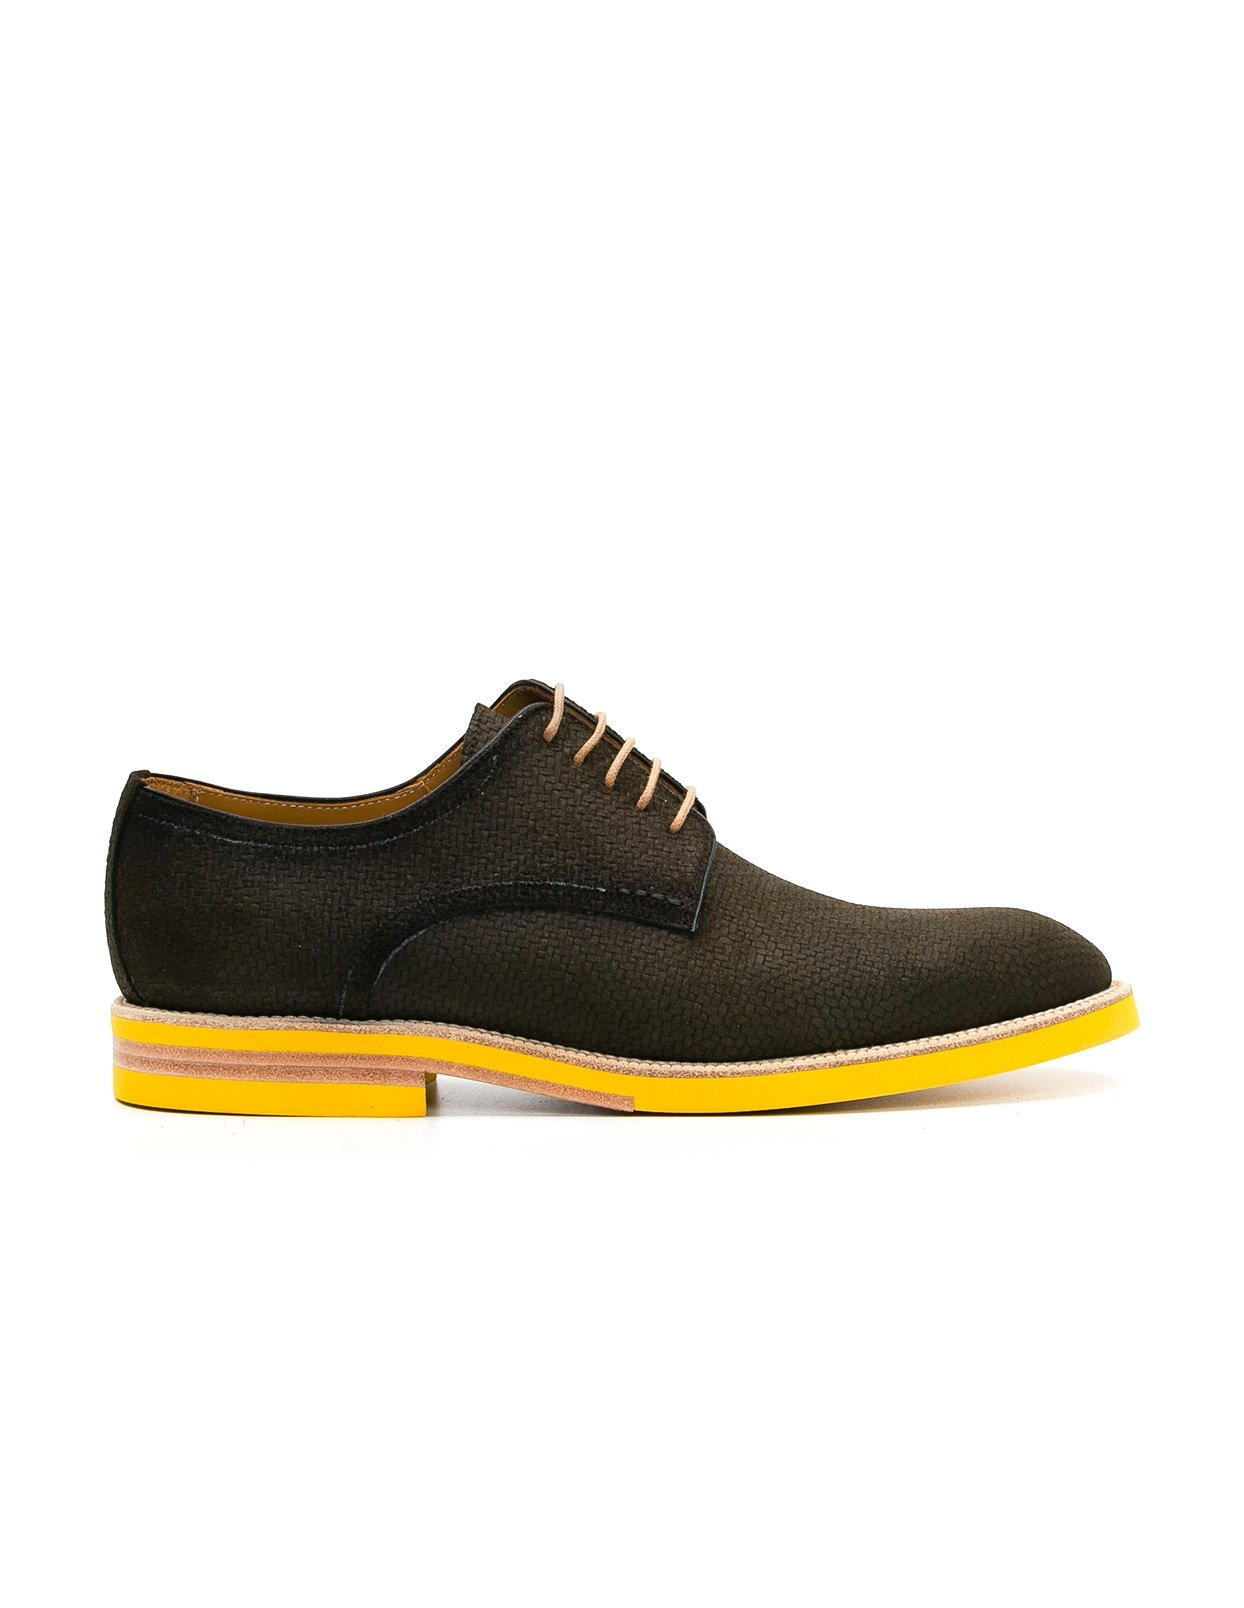 Calzado Sport Wear color kaki, 100% Serraje.